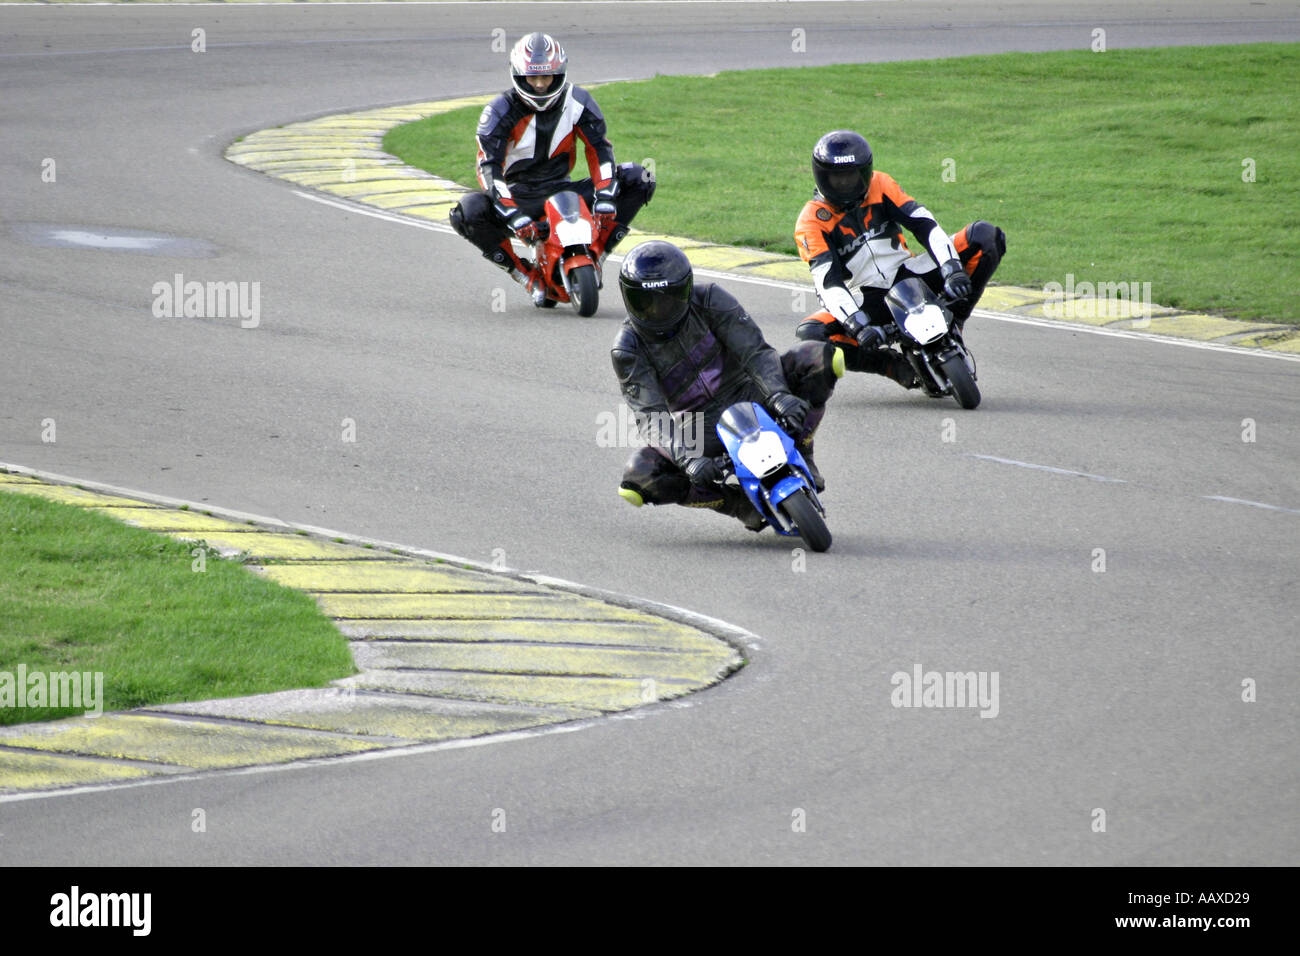 Small Tiny Mini Moto Minimoto Bike Motorbike Motorcycle Monkey Monkeybike  Bike Race Racetrack Track Knee Down Great Pictures